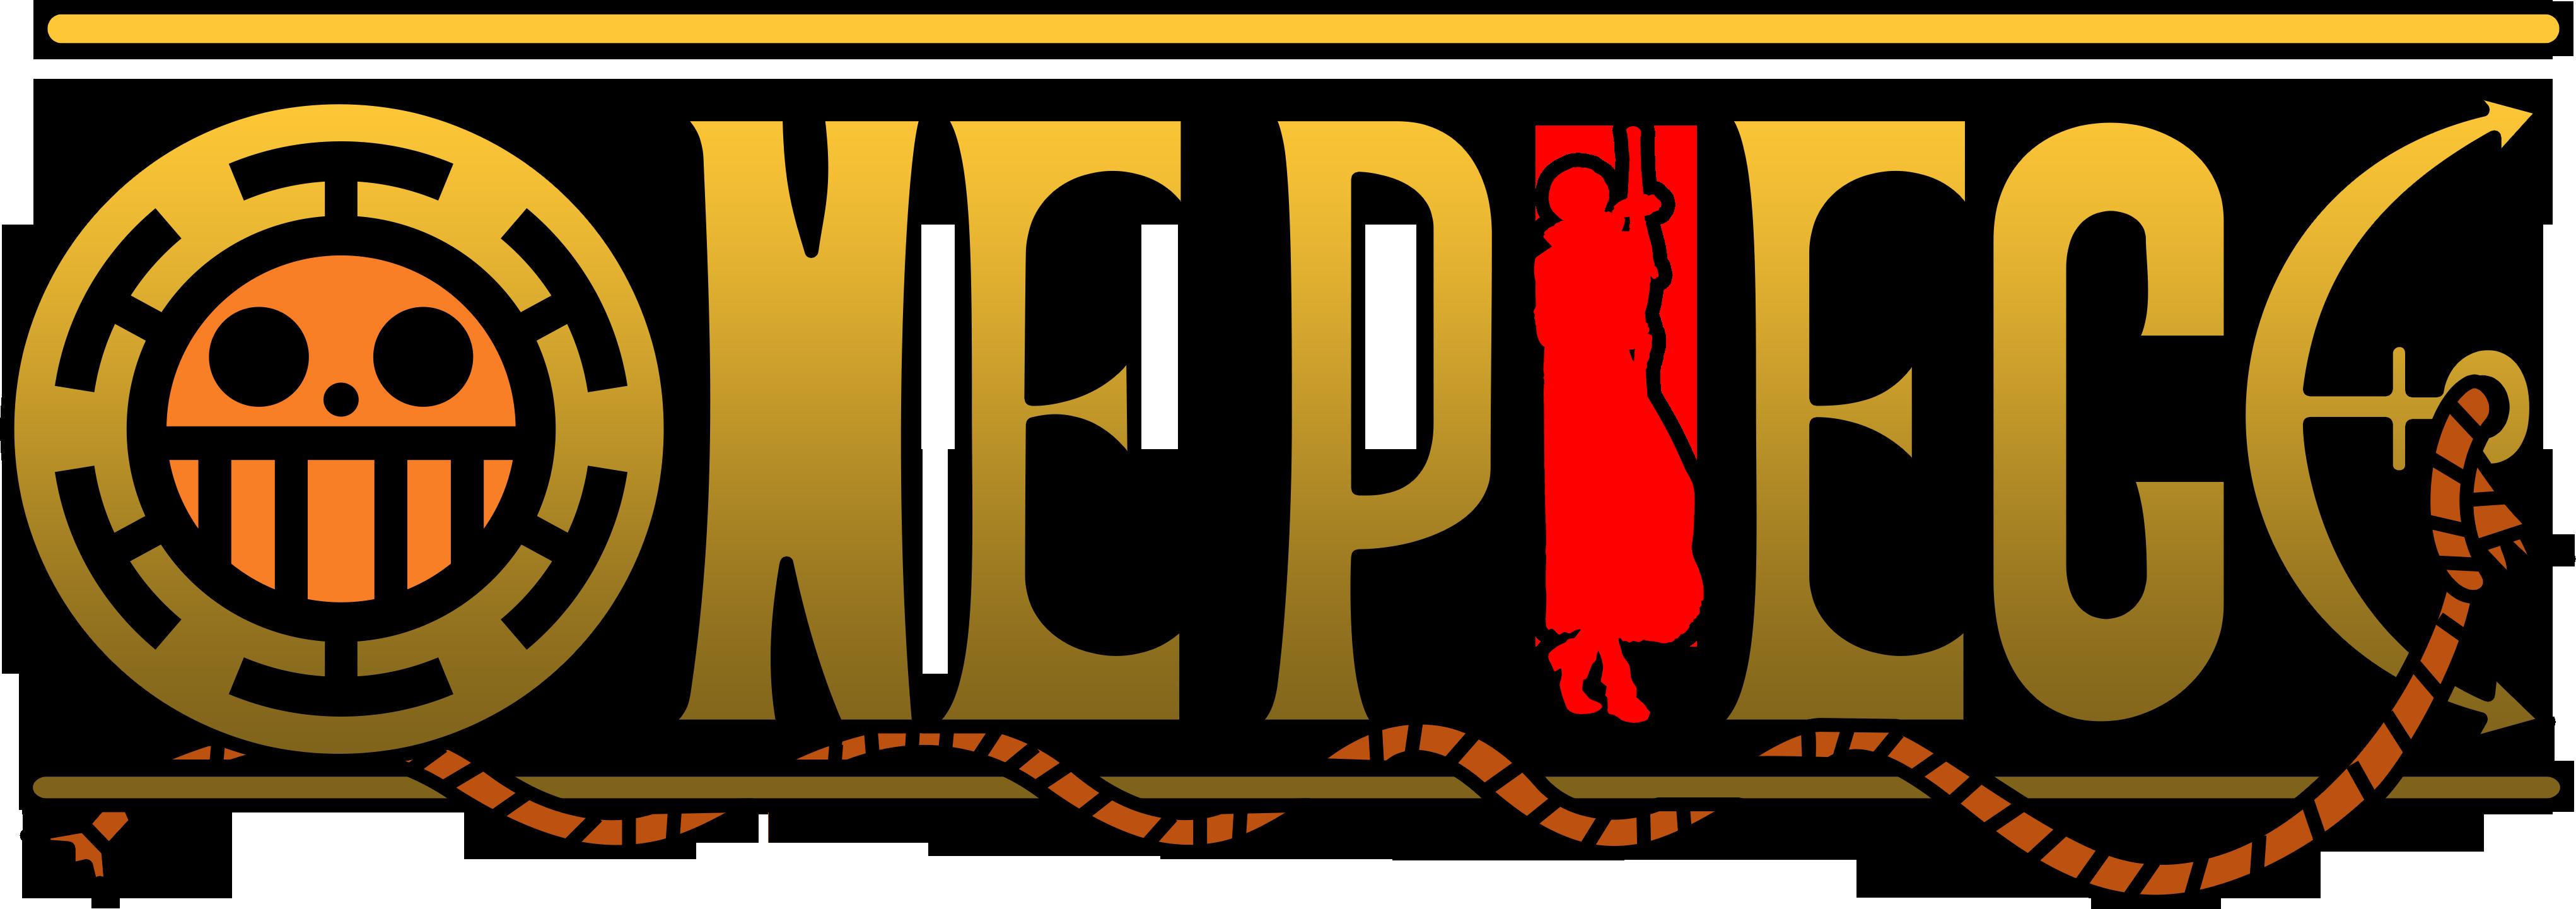 Browse HR Photos of One Piece Ace Logo for desktop screen 4085x1441